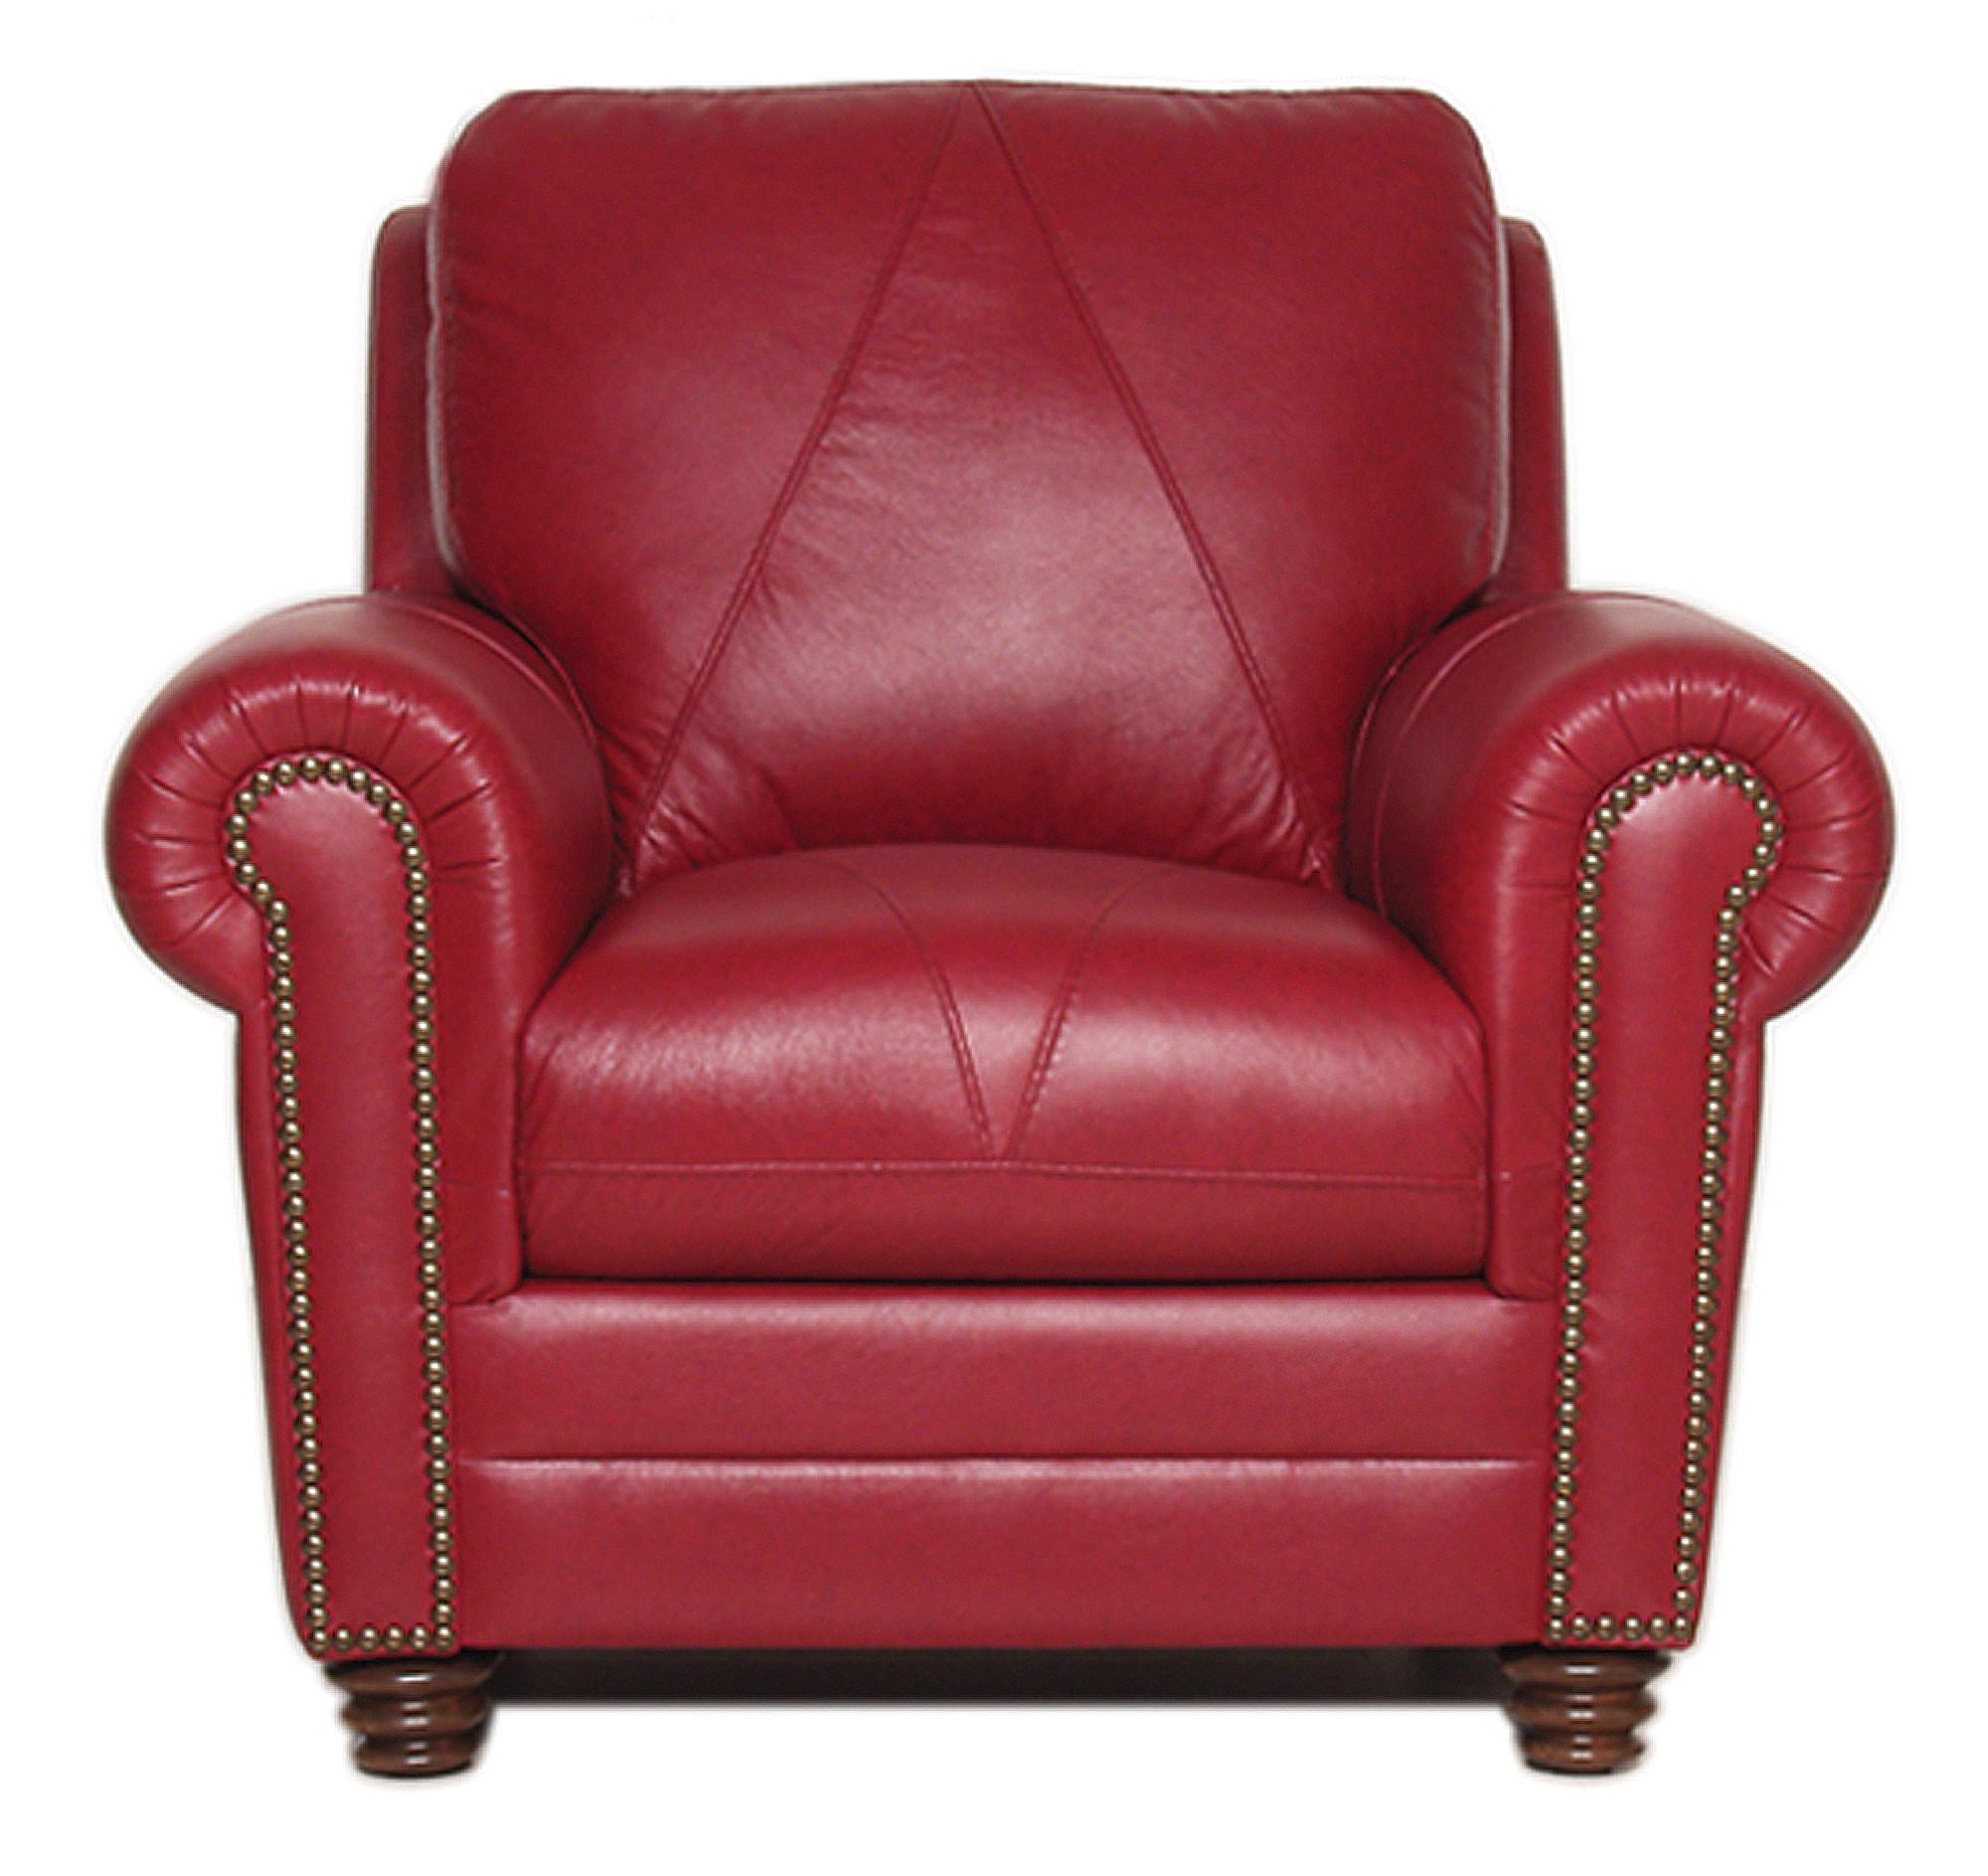 Red Faux Leather Sofa hmmi